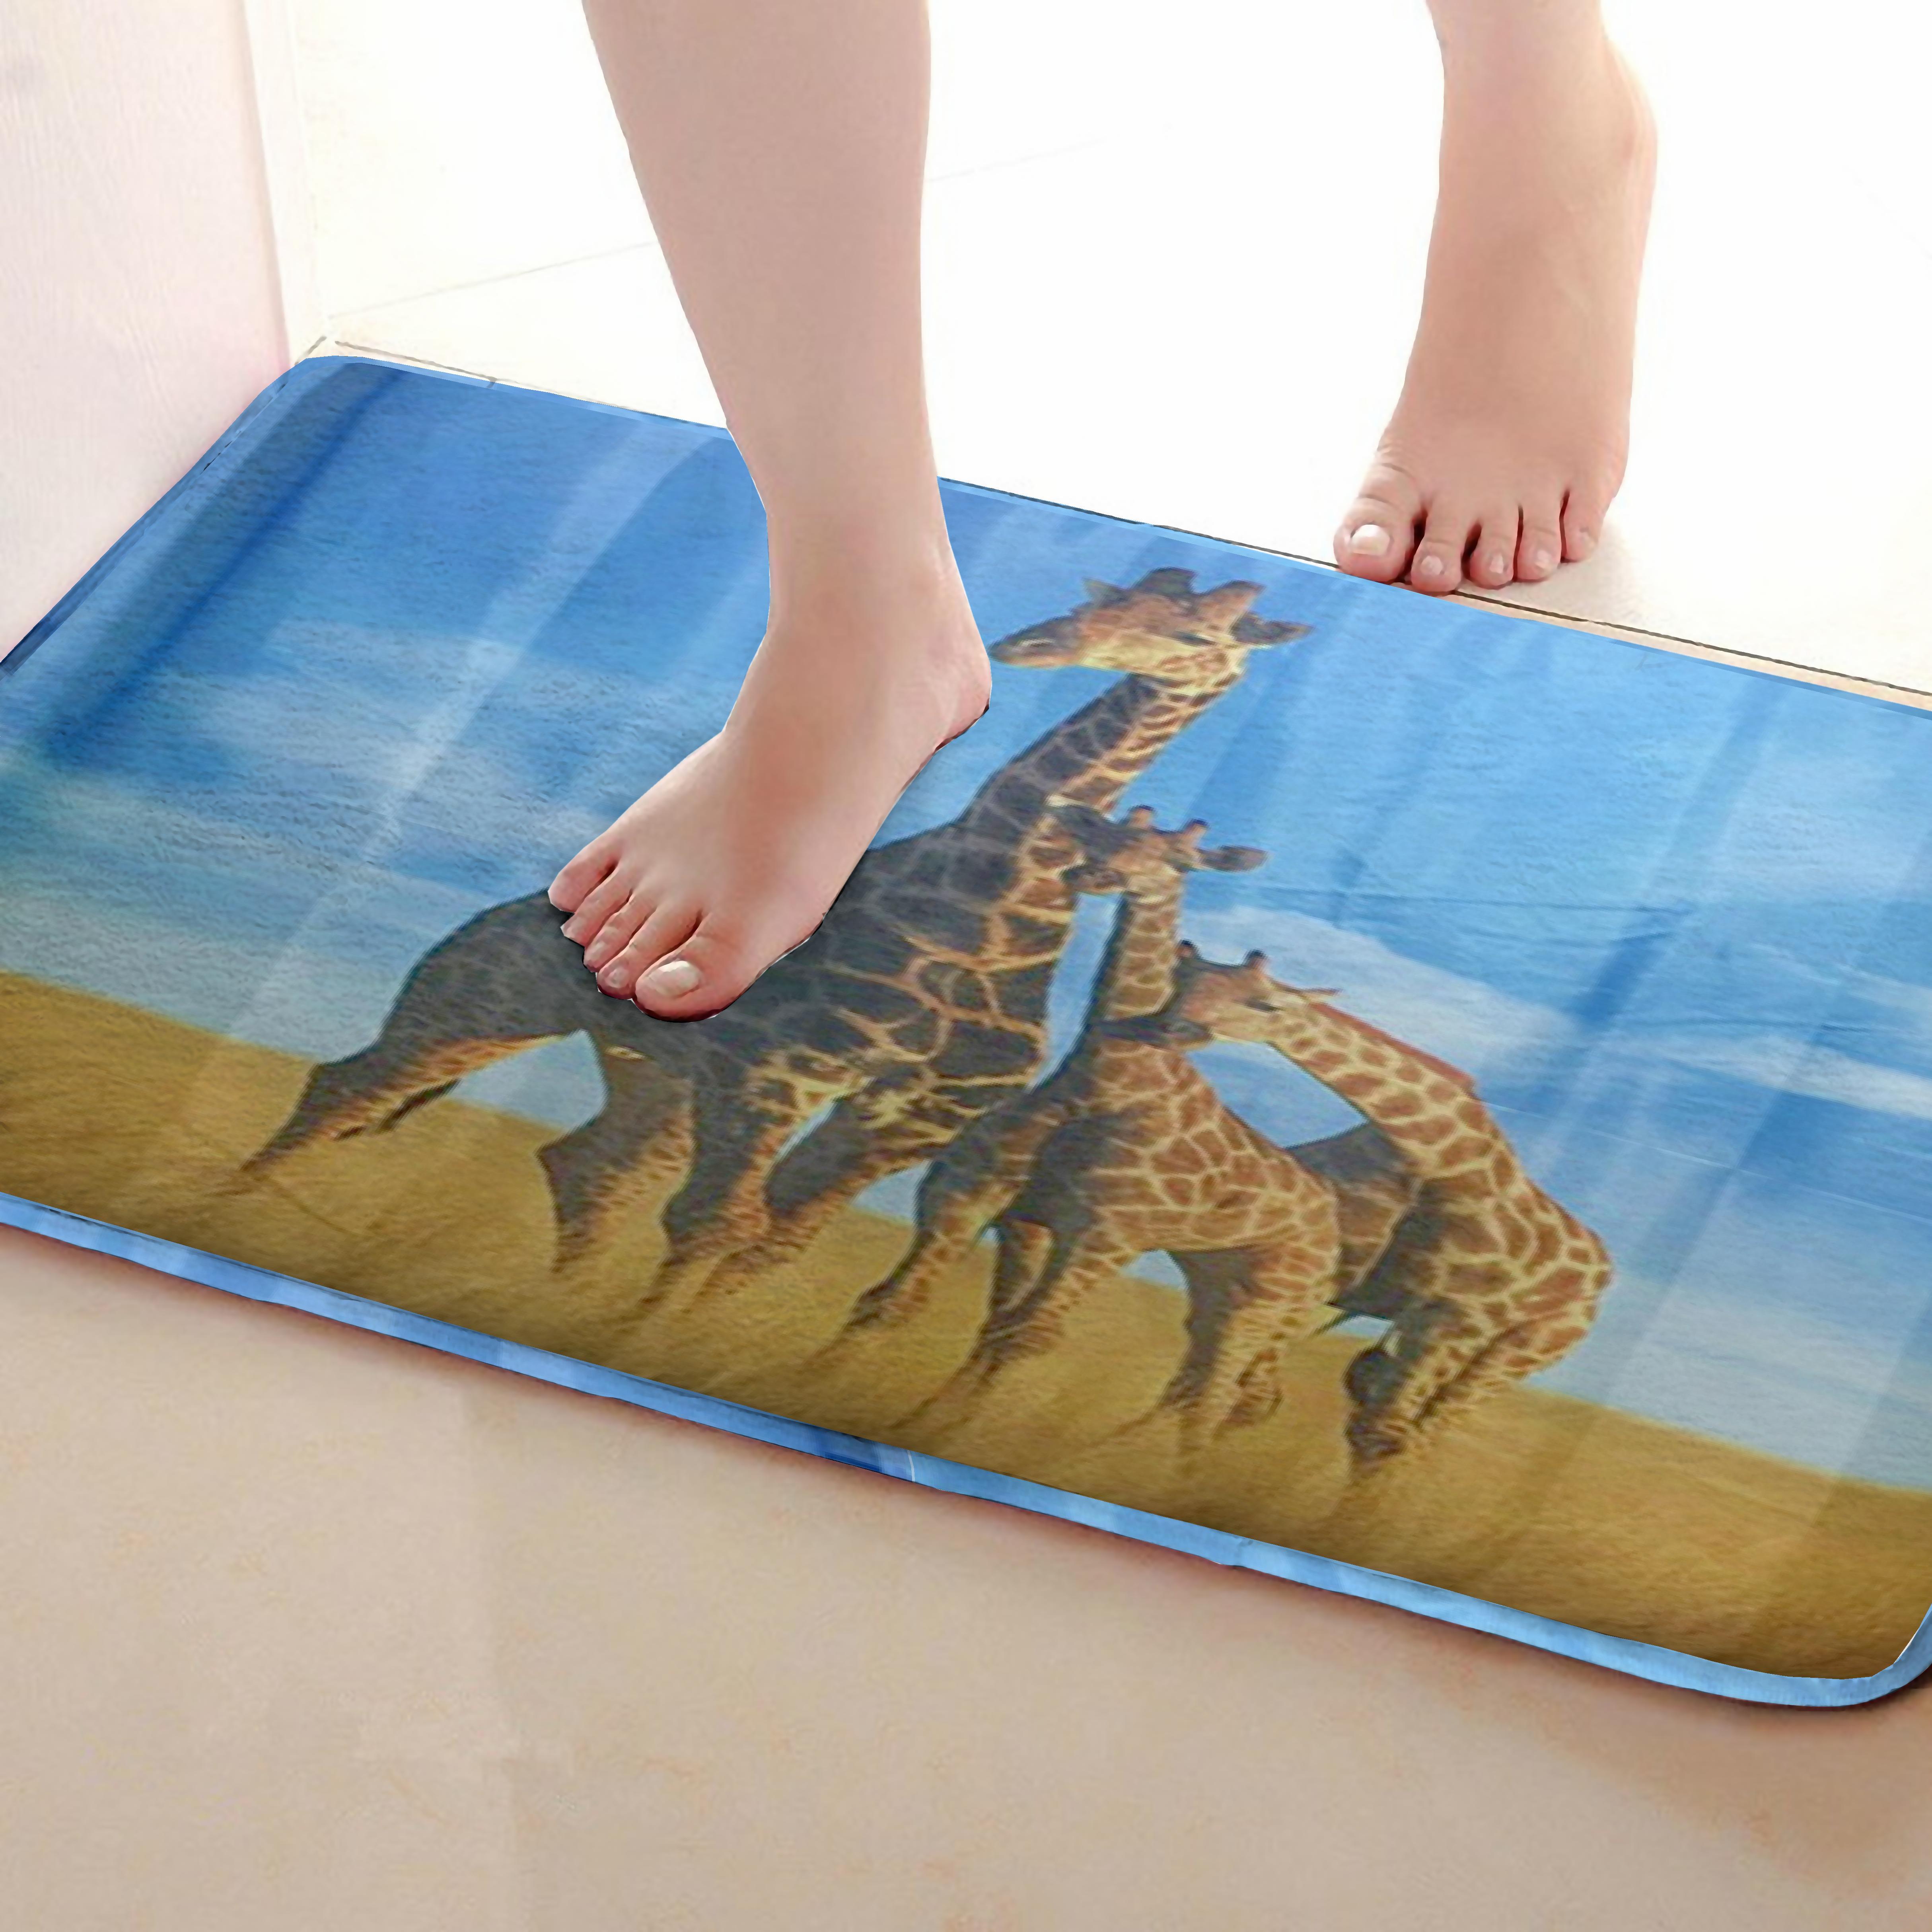 Giraffe Style Bathroom Mat,Funny Anti Skid Bath Mat,Shower Curtains Accessories,Matching Your Shower Curtain